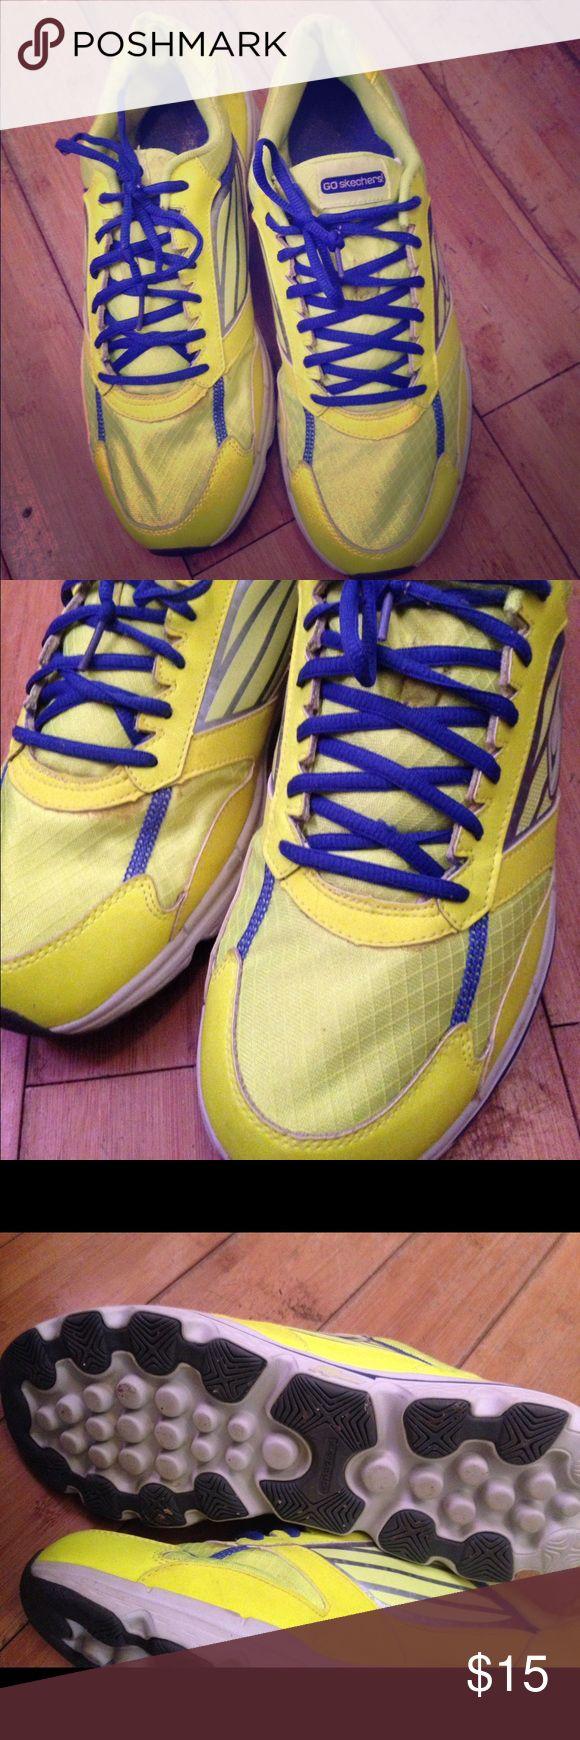 Men's Skechers tennis Neon yellow and navy blue color! Men's size 12.5 Skechers Shoes Athletic Shoes